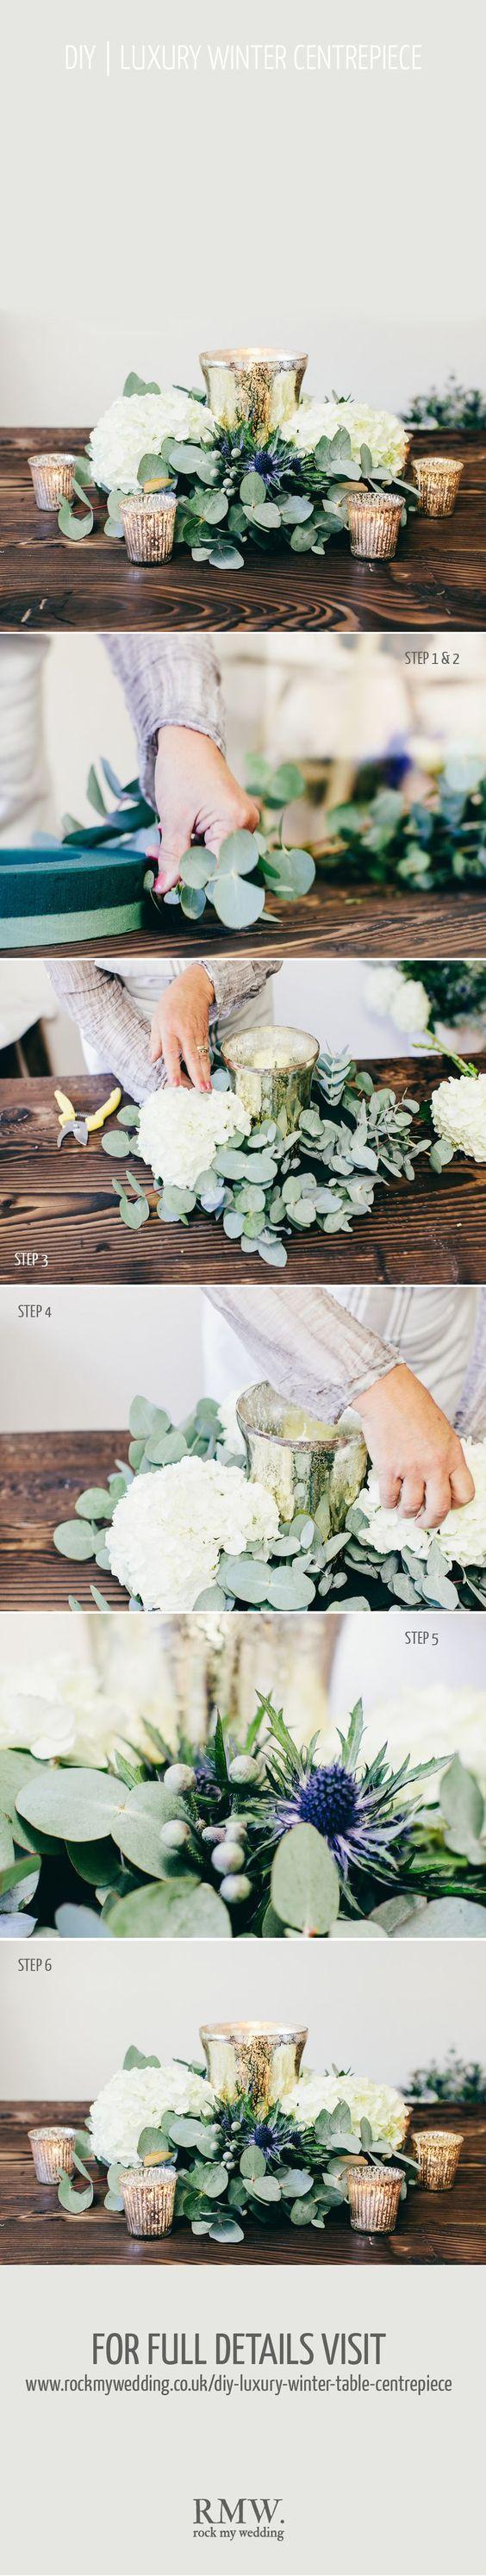 best wedding ideas images on pinterest wedding ideas mariage